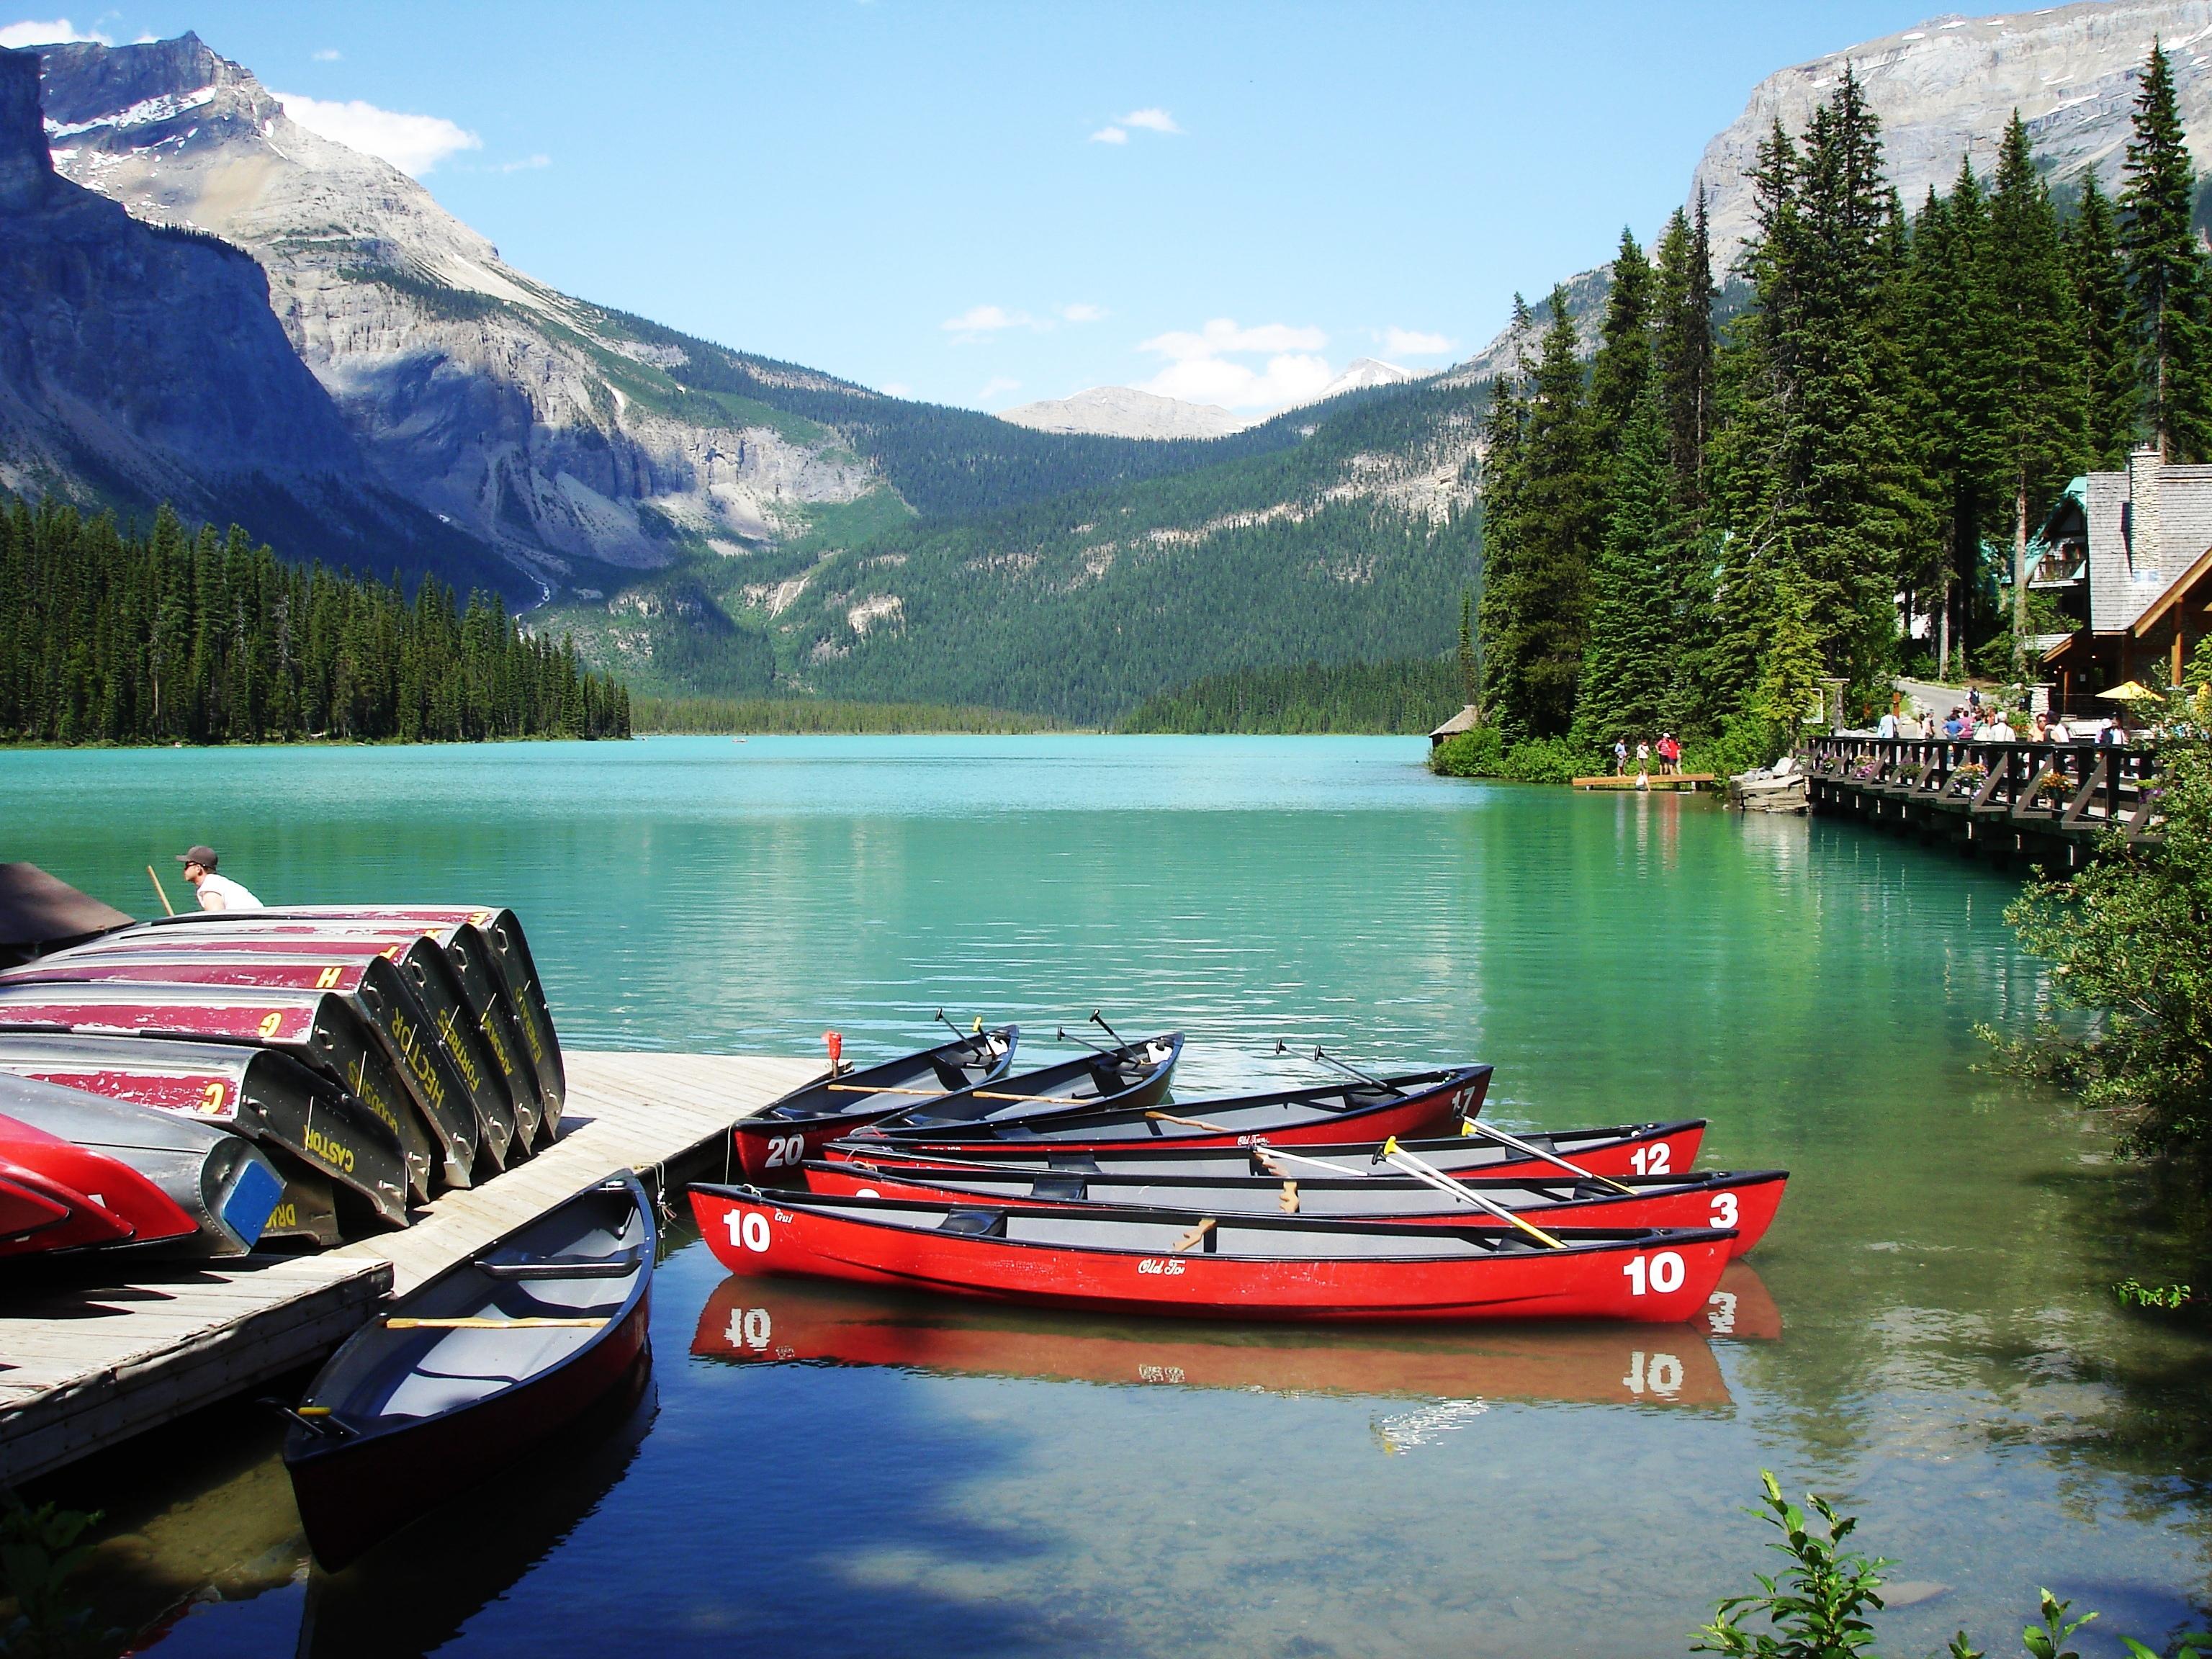 「emerald lake」の画像検索結果